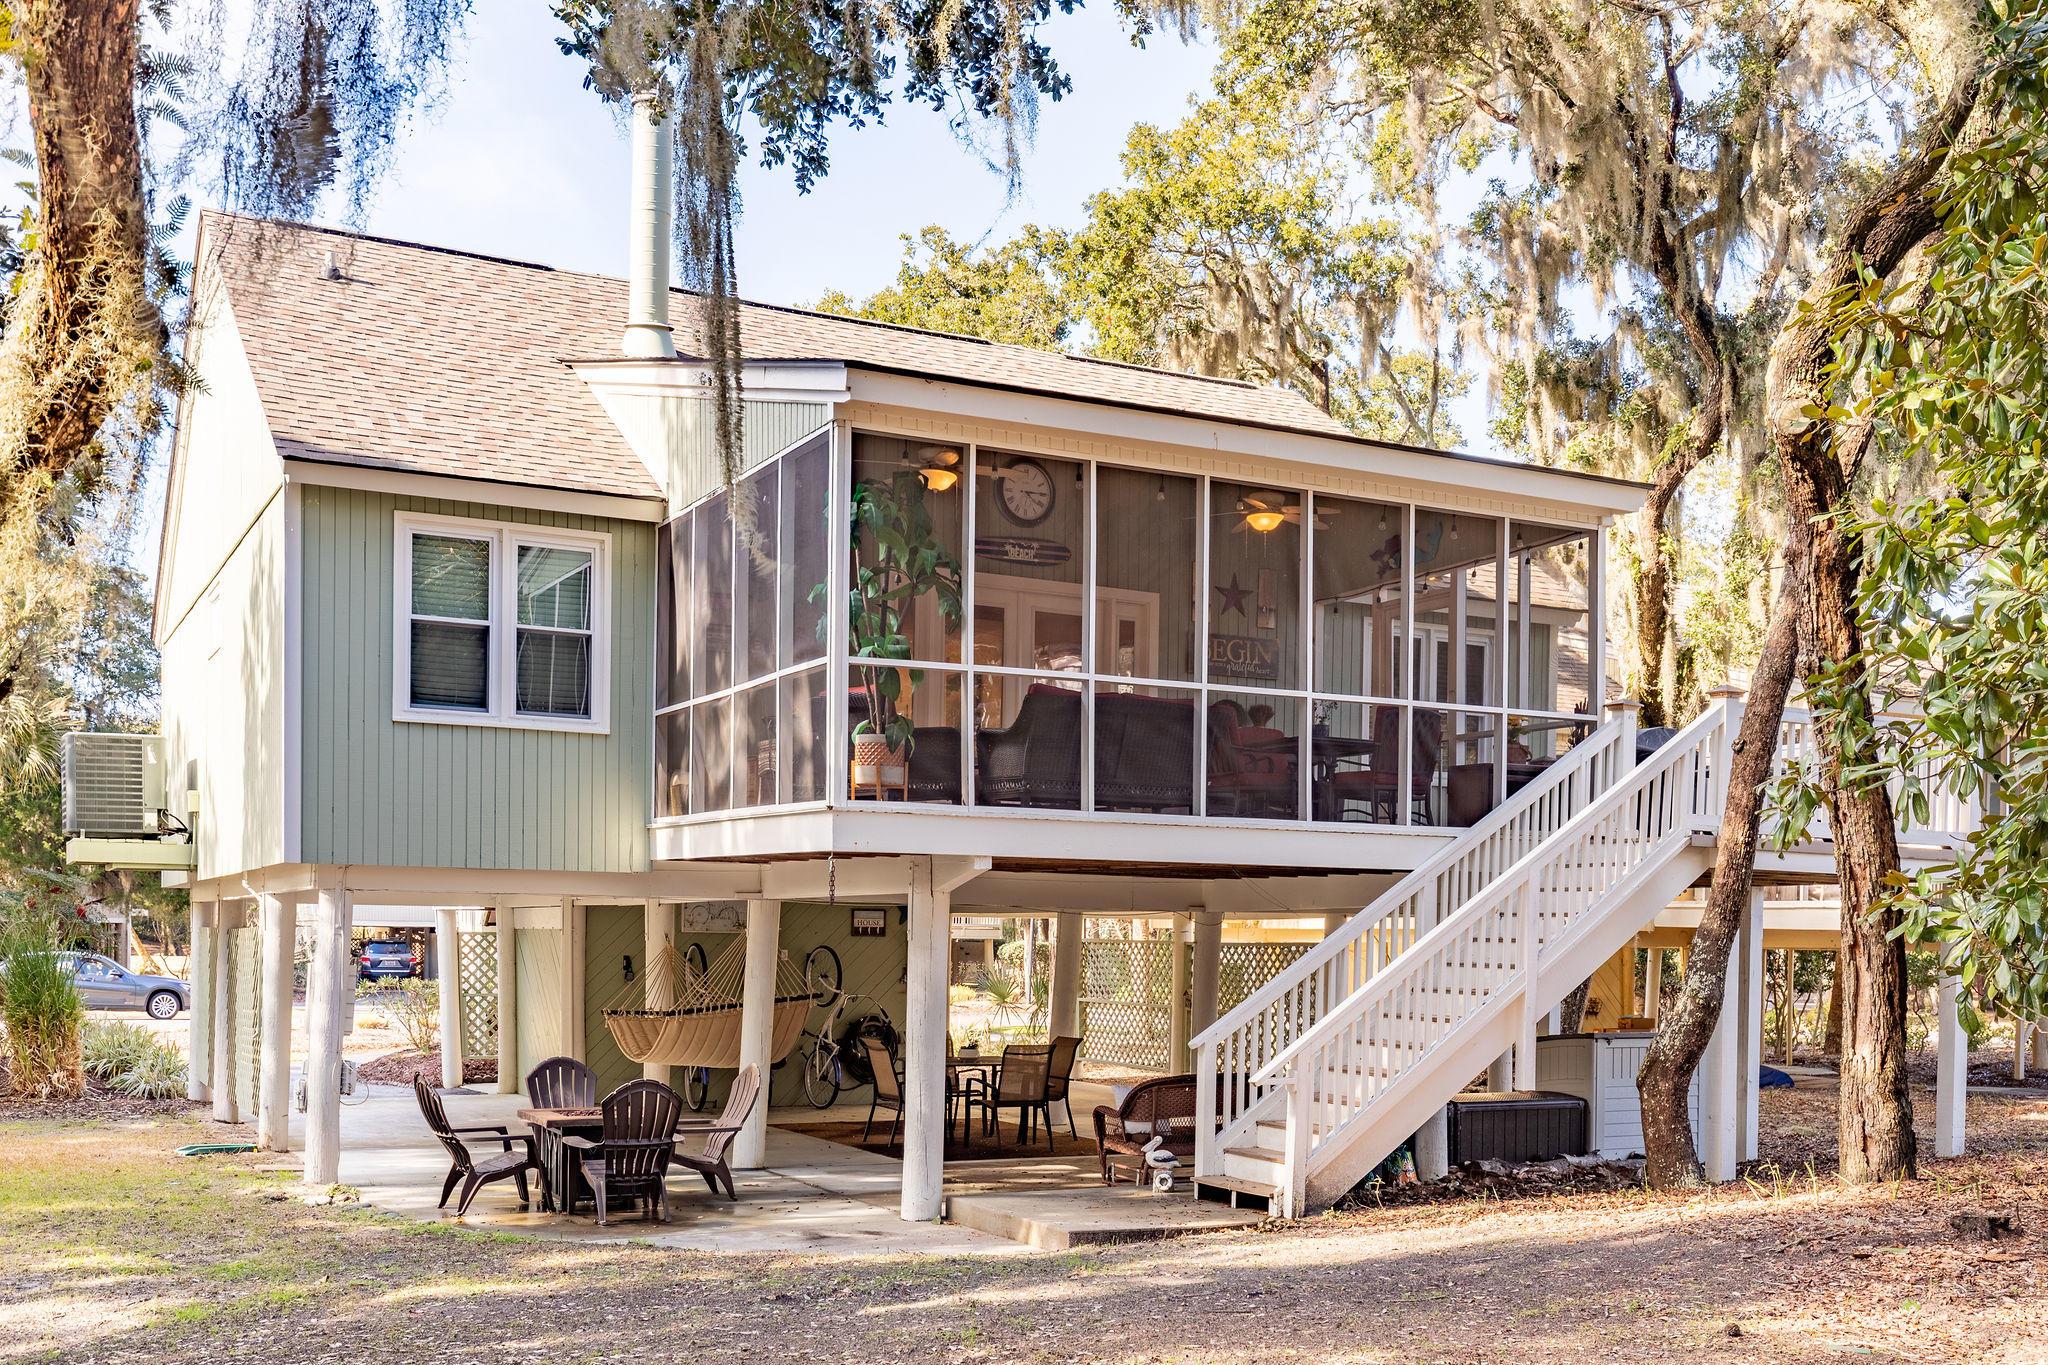 Seabrook Island Homes For Sale - 515 Cobby Creek, Seabrook Island, SC - 18